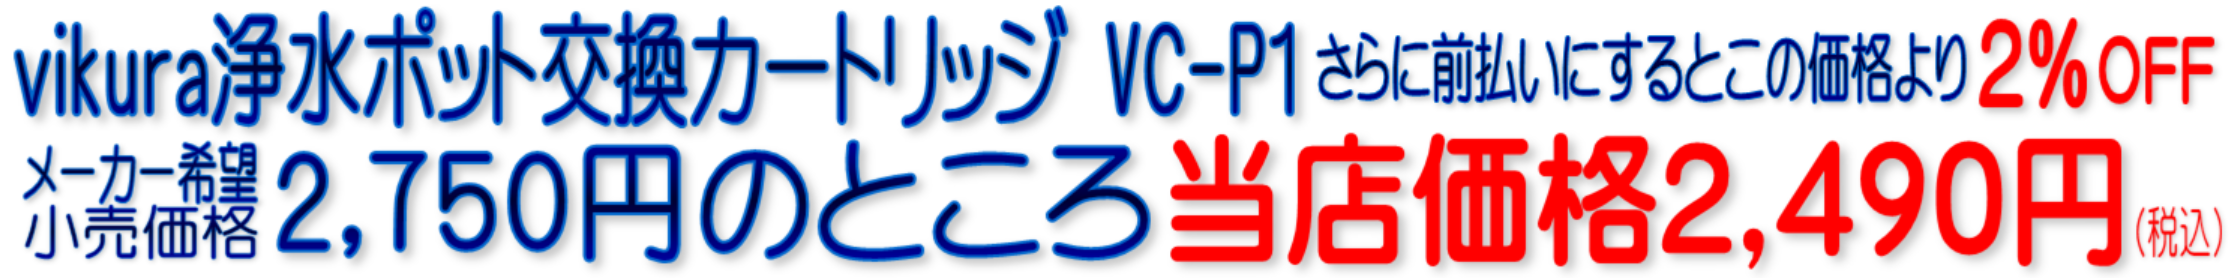 vikura浄水ポット ビクラ浄水ポット VF-P1 VC-P1